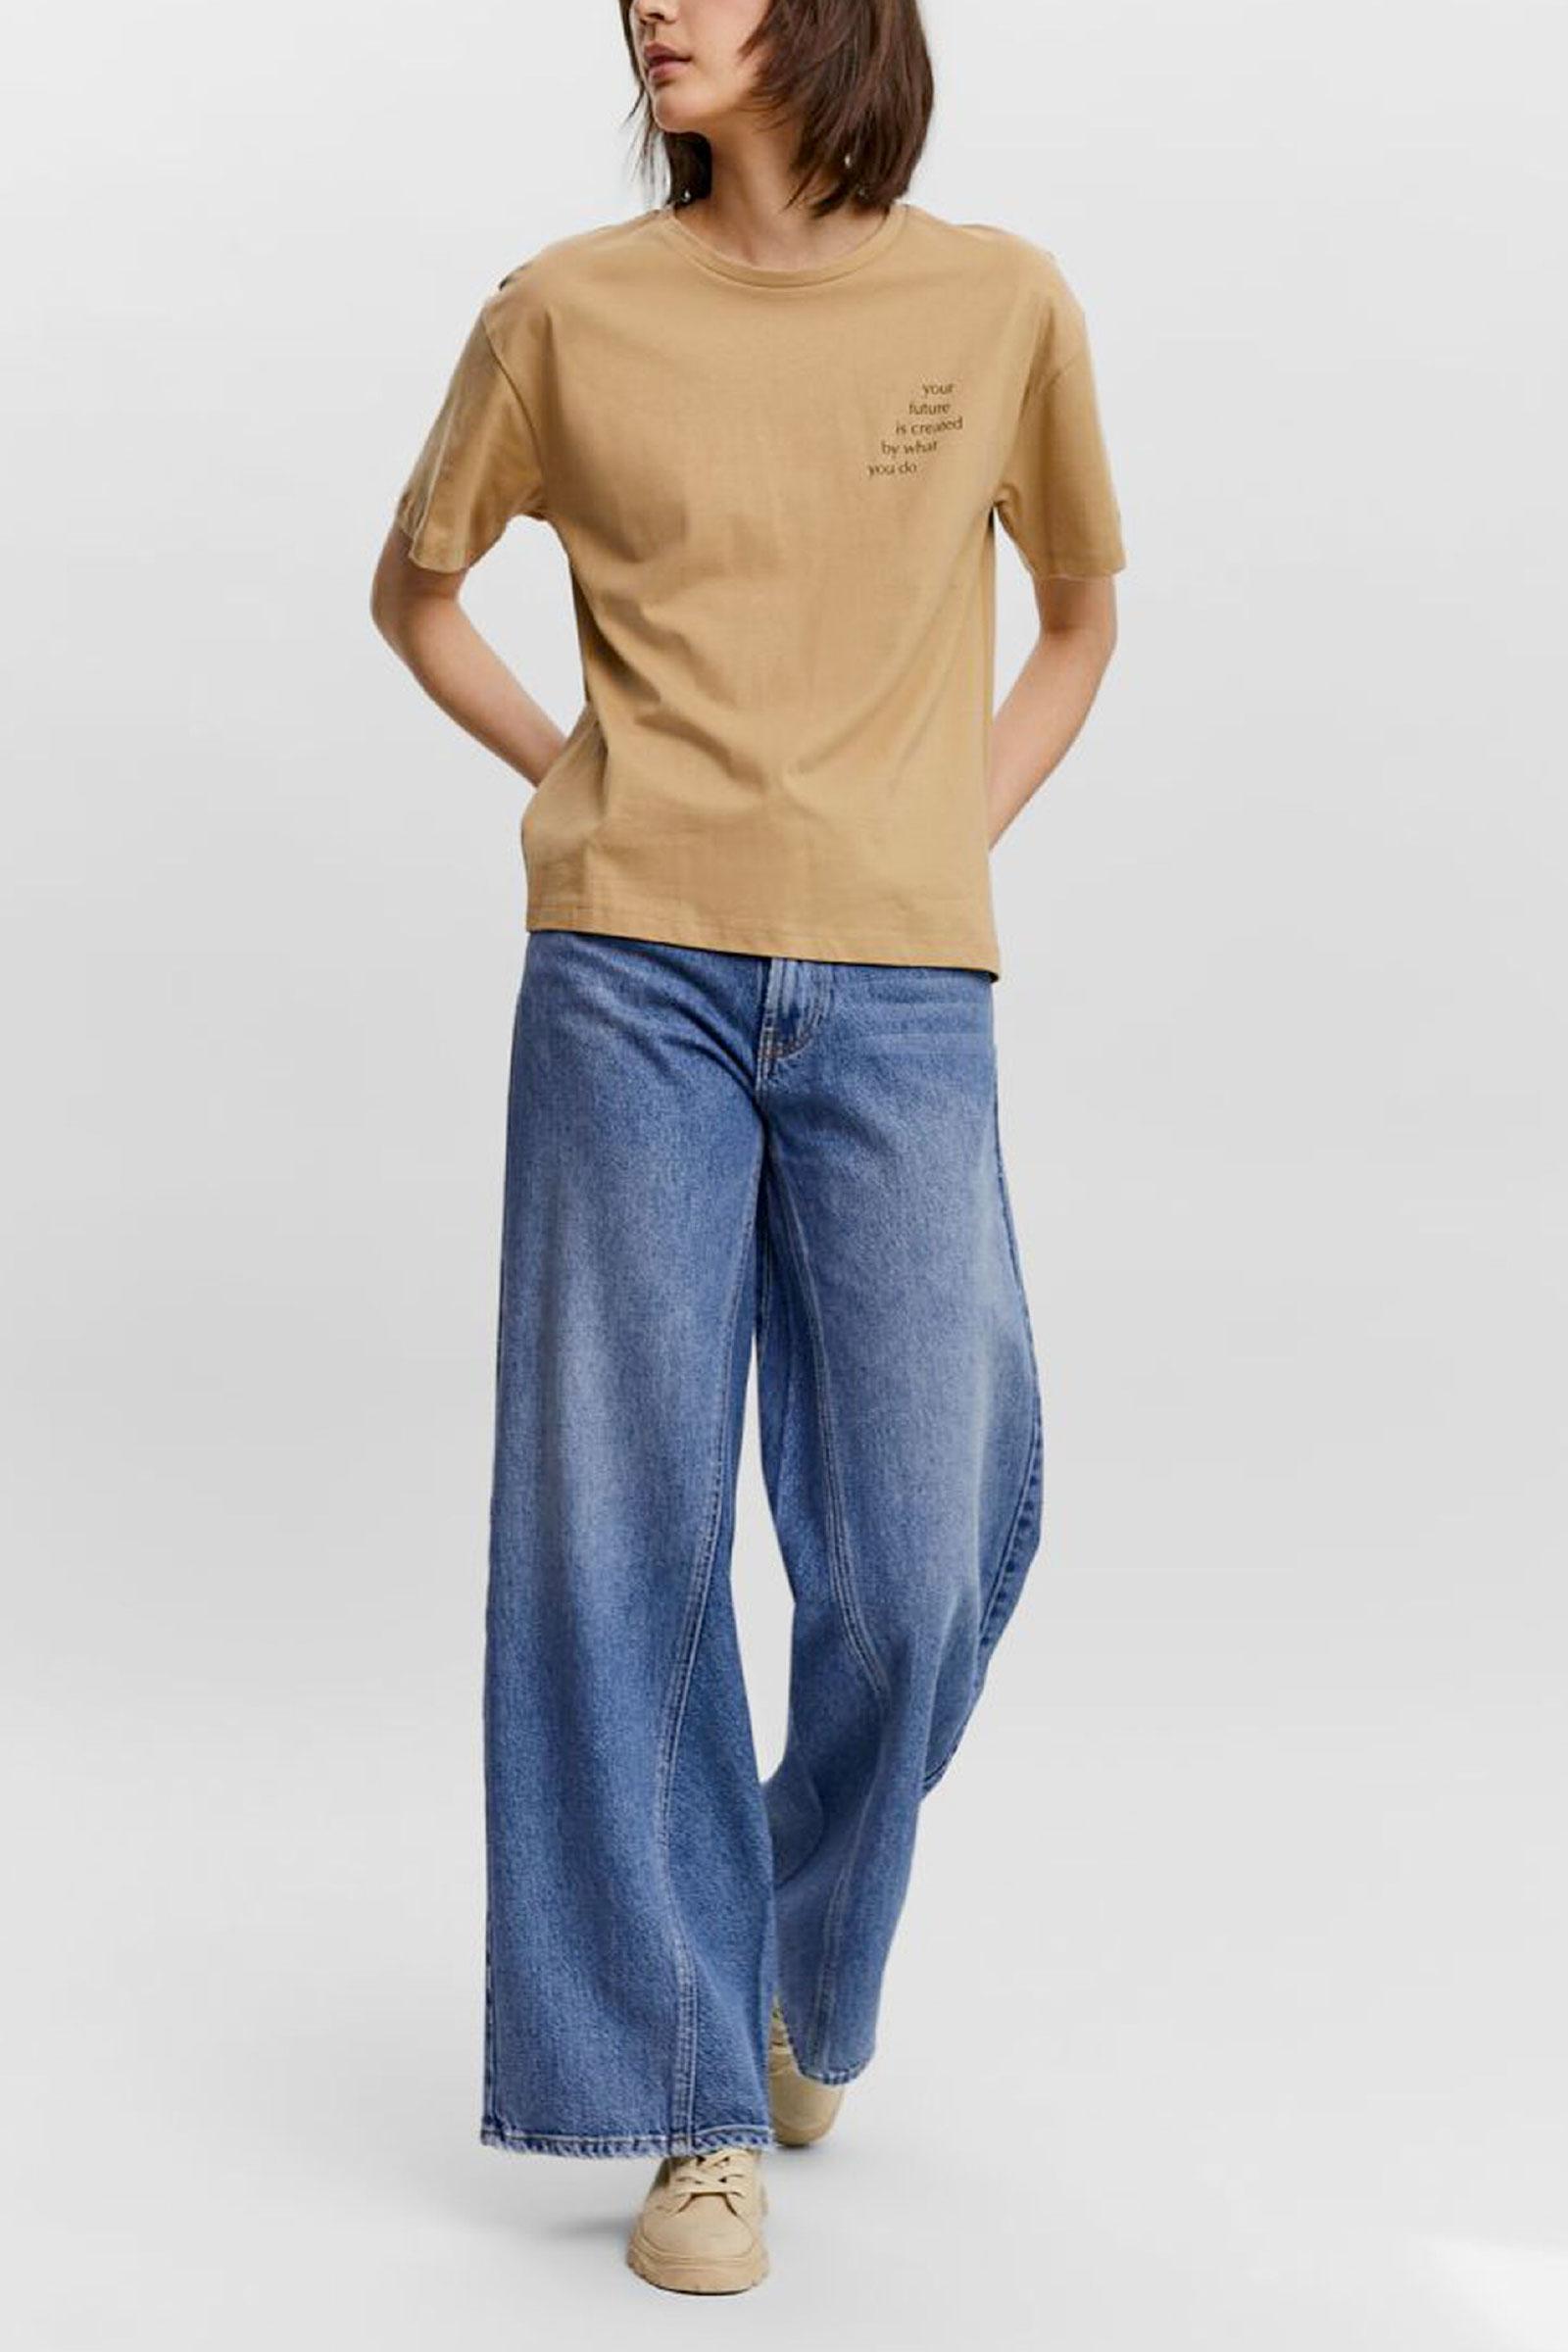 T-Shirt Donna VERO MODA   T-Shirt   10235139Detail-BLACK DIAGONAL